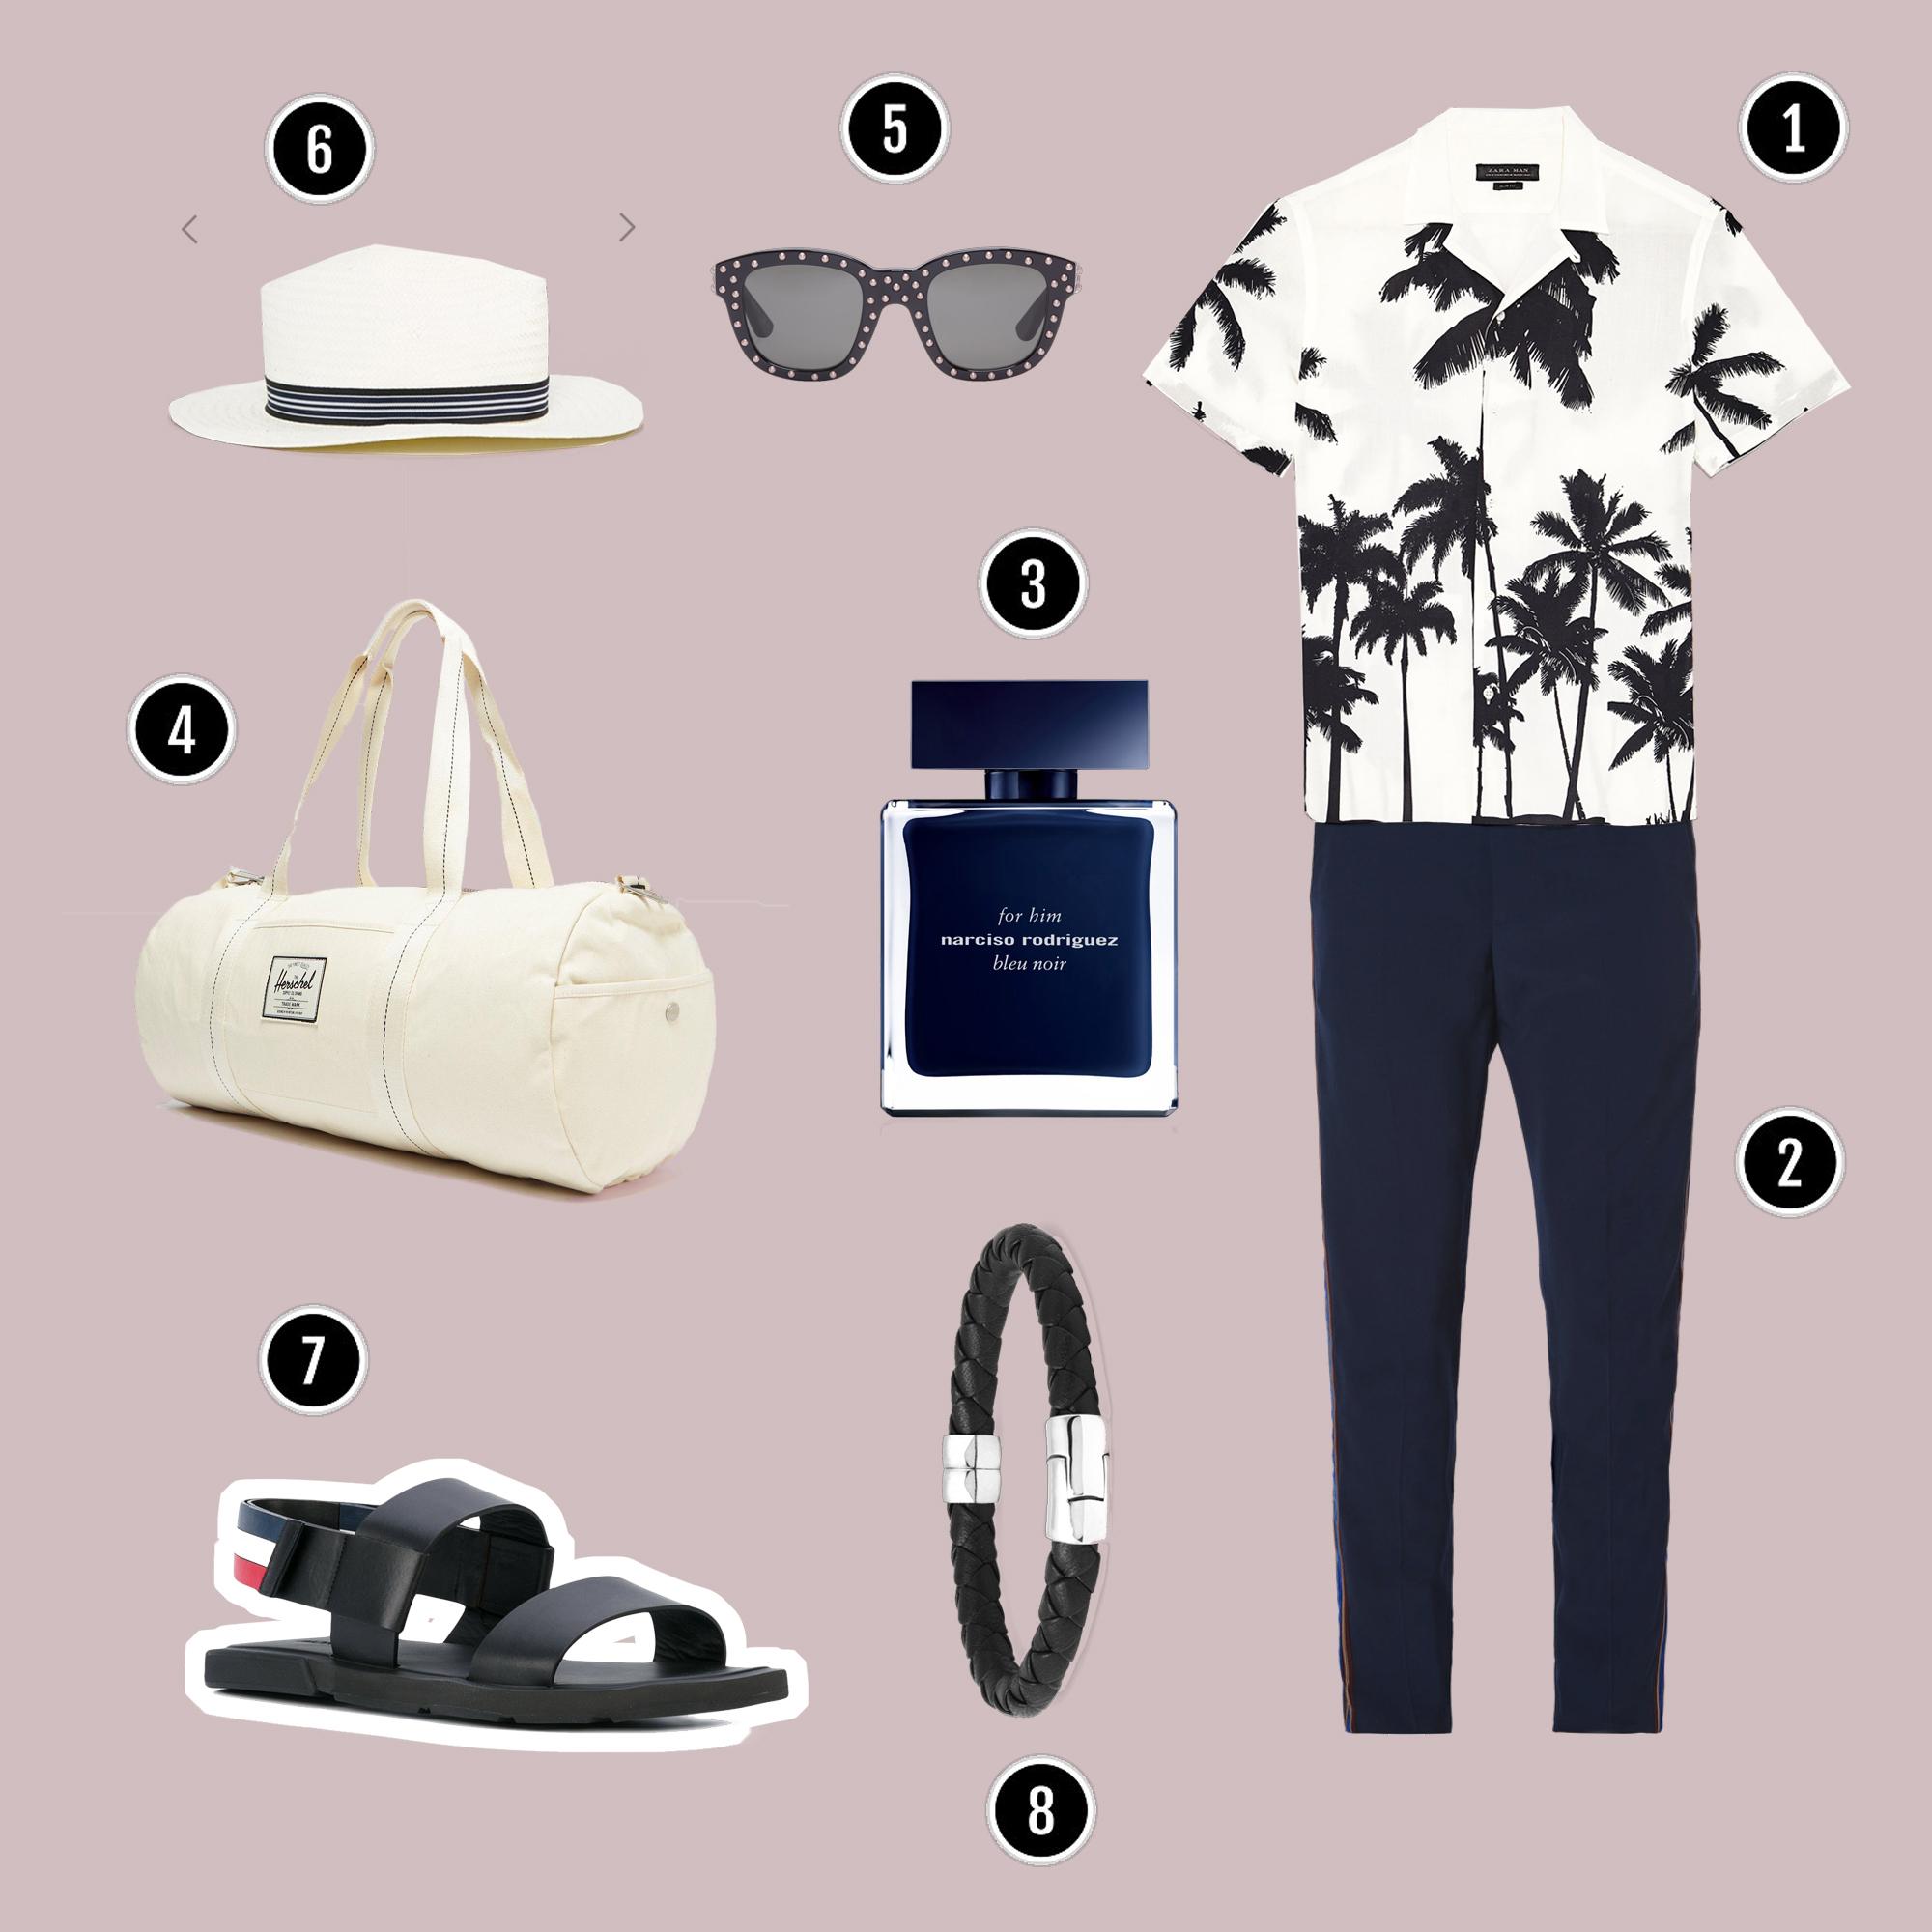 1.Áo : Zara / 2.Quần : Acne Studios / 3.Nước hoa : Narciso Bleu Noir / 4.Túi : Herchel / 5.Kính : Saint Laurent / 6.Nón : Asos / 7.Sandals : Thom Browne / 8.Vòng tay : BOTTEGA